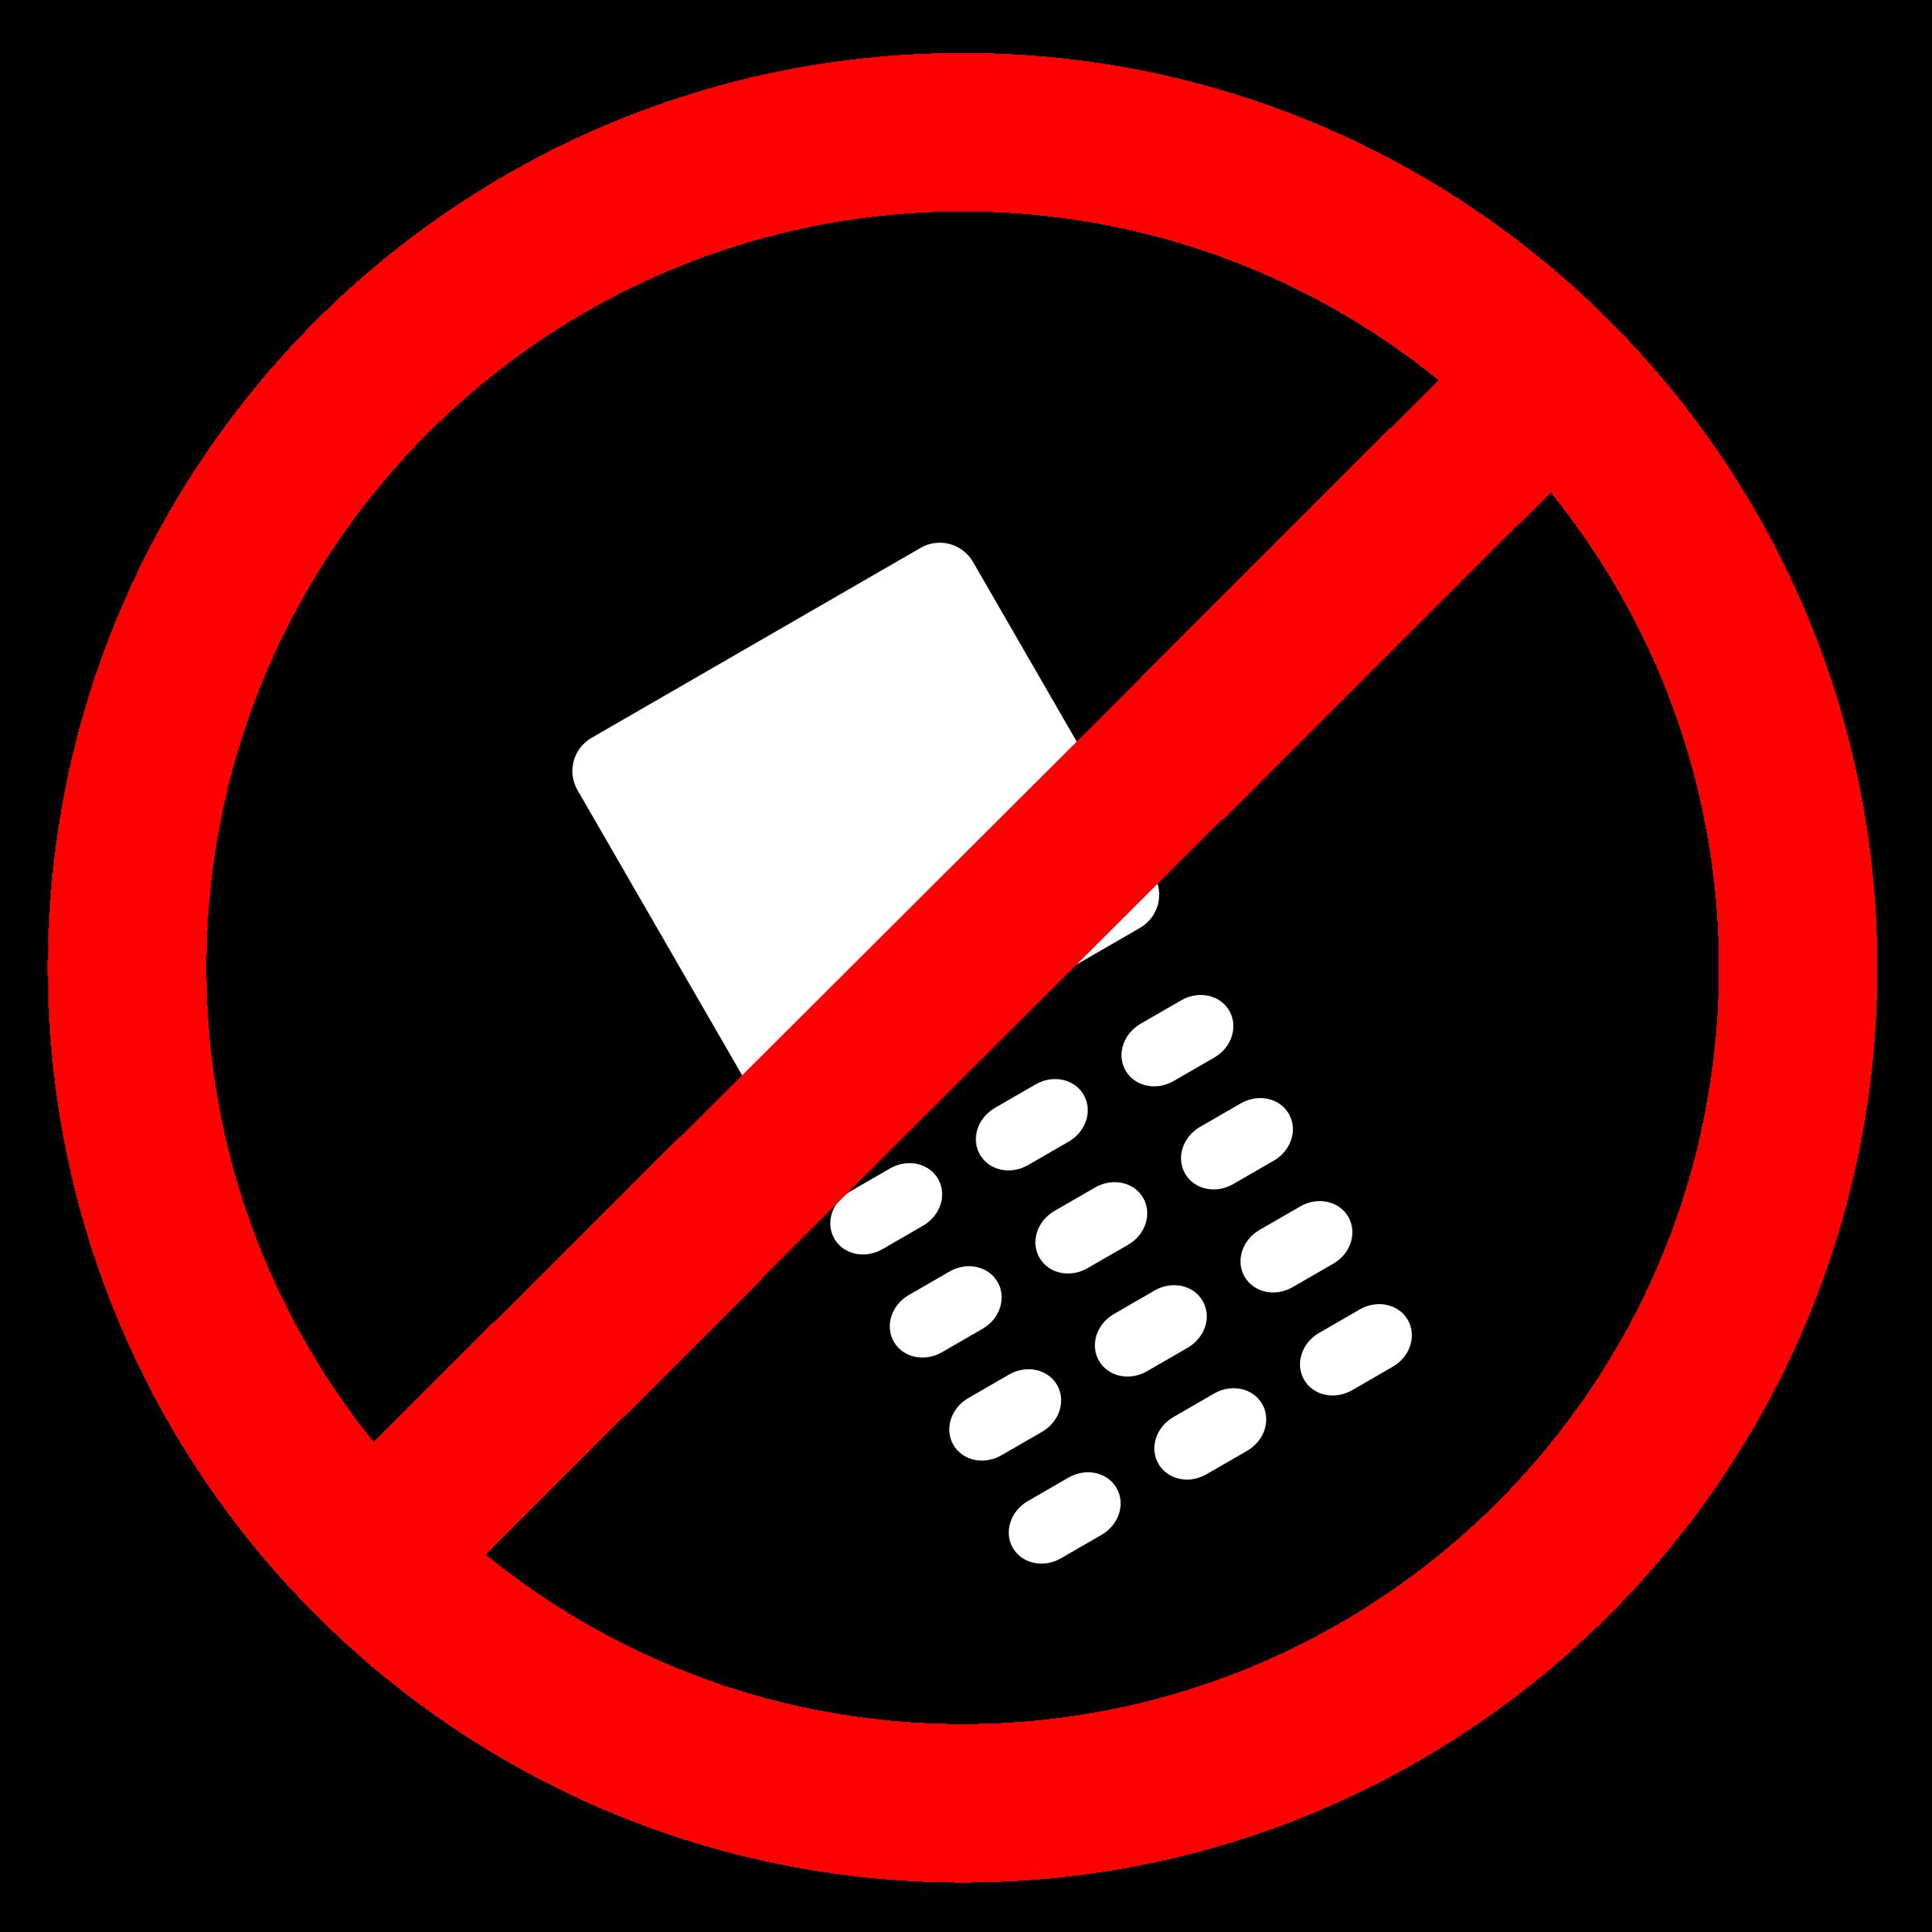 No Cell Phones Allowed-No Cell Phones Allowed-16